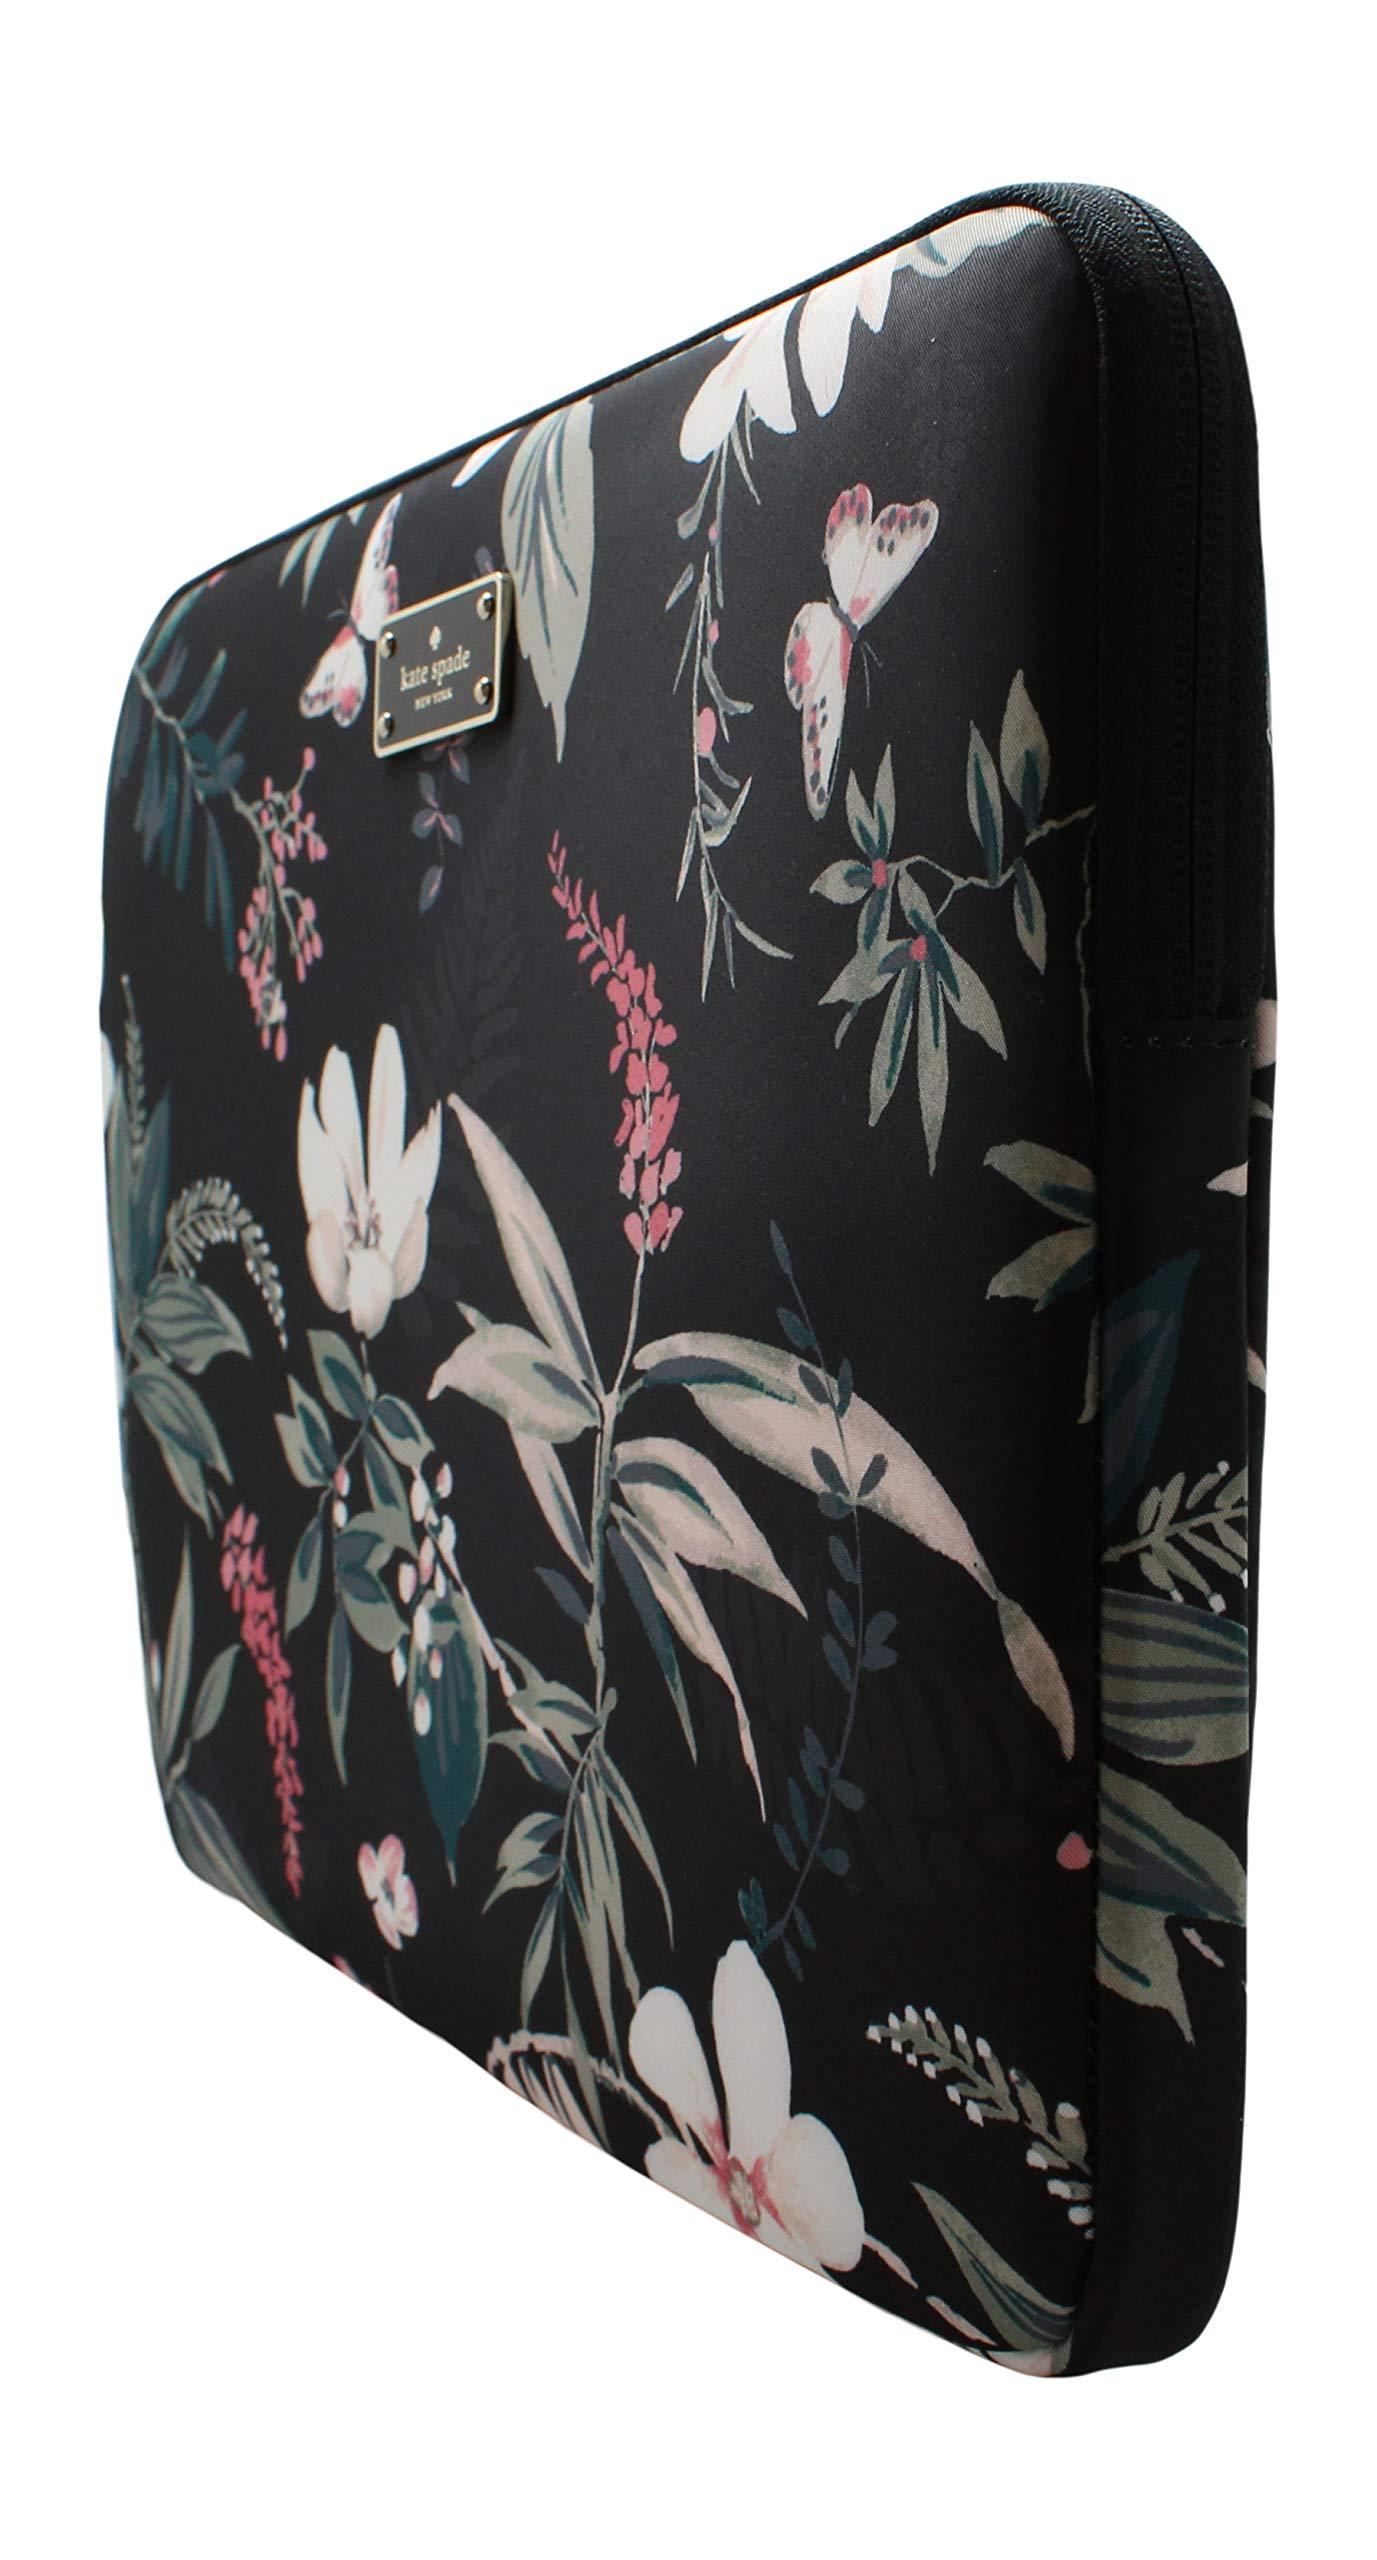 Kate Spade Wilson Rd Botanical Laptop Case Sleeve Black Multi 13'' by Kate Spade New York (Image #5)